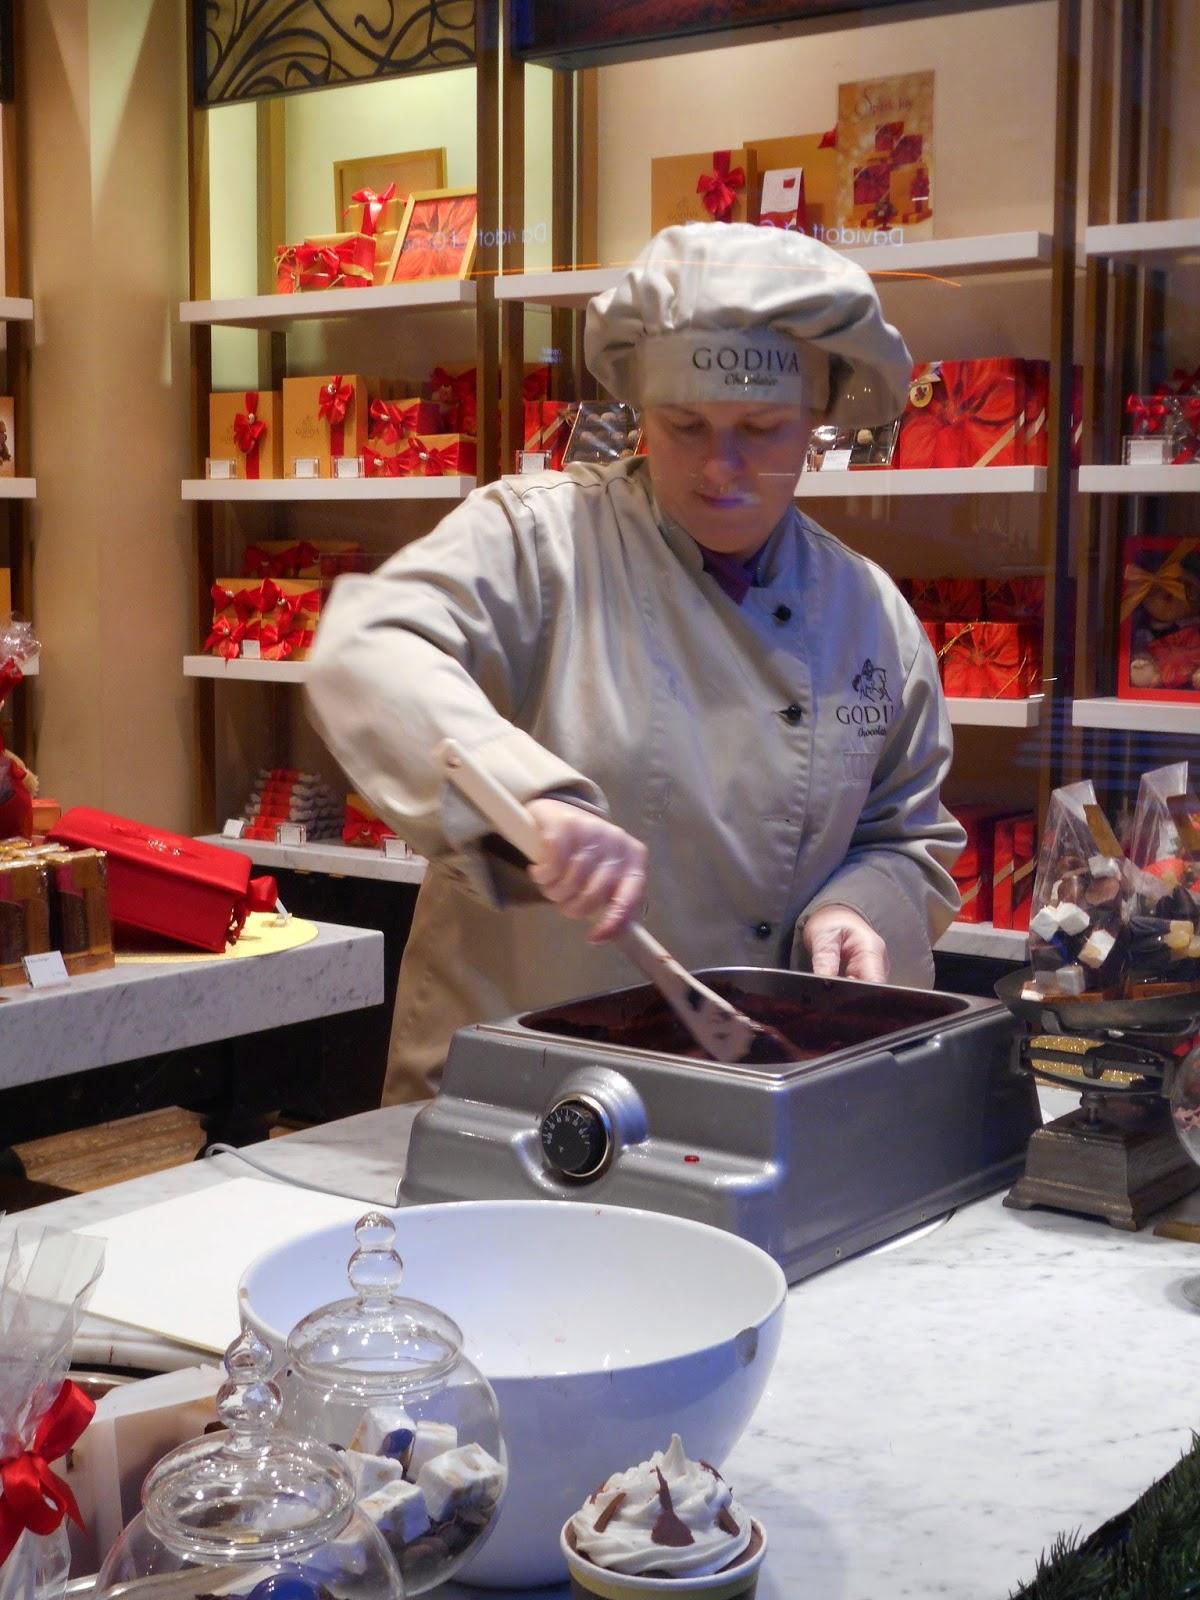 Fraises chocolat Godiva